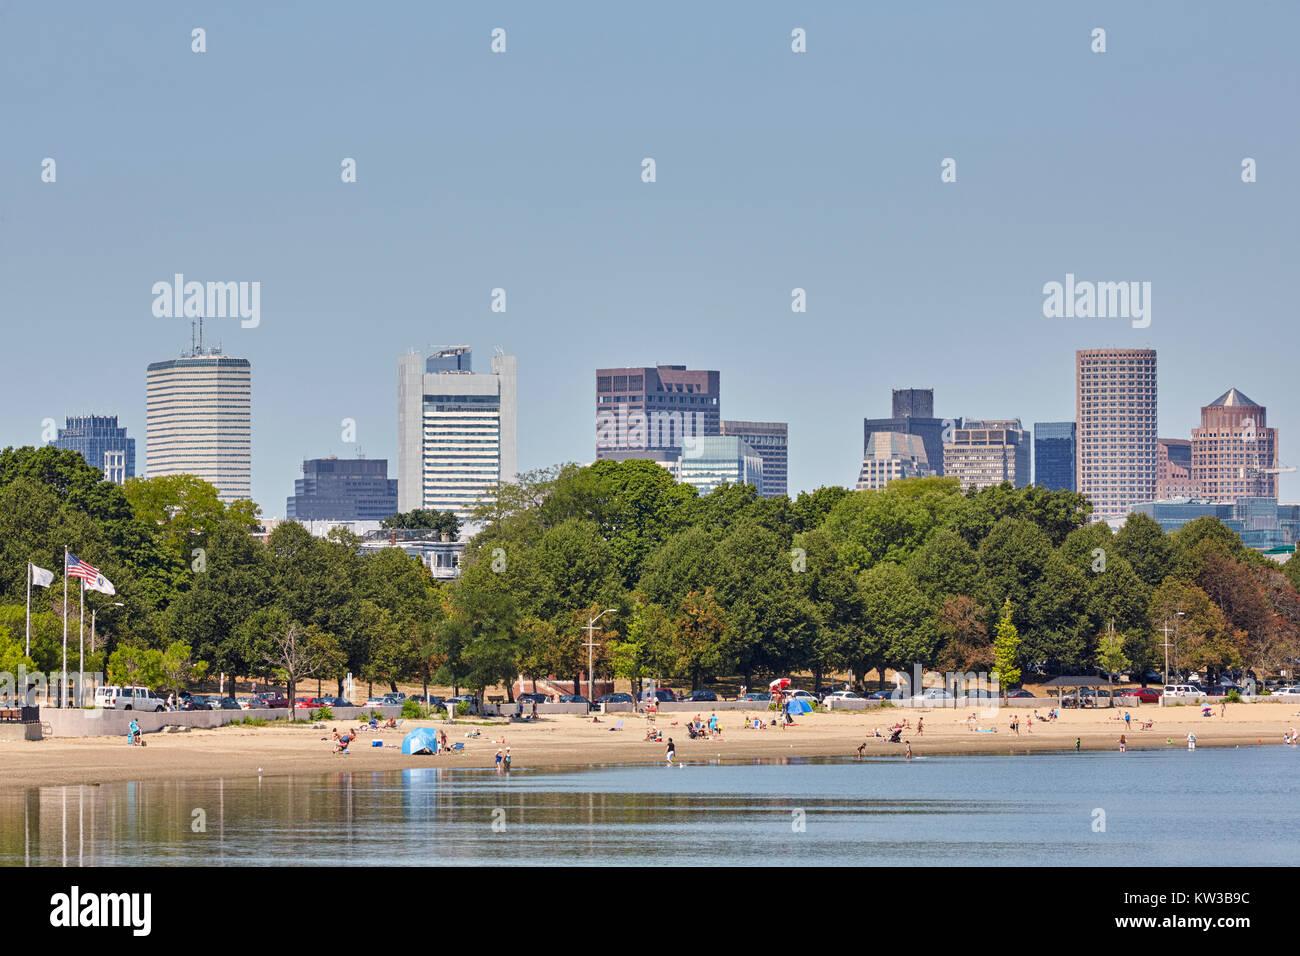 Placer Bay Beach, cerca de Castle Island, South Boston, Massachusetts, EE.UU. Foto de stock